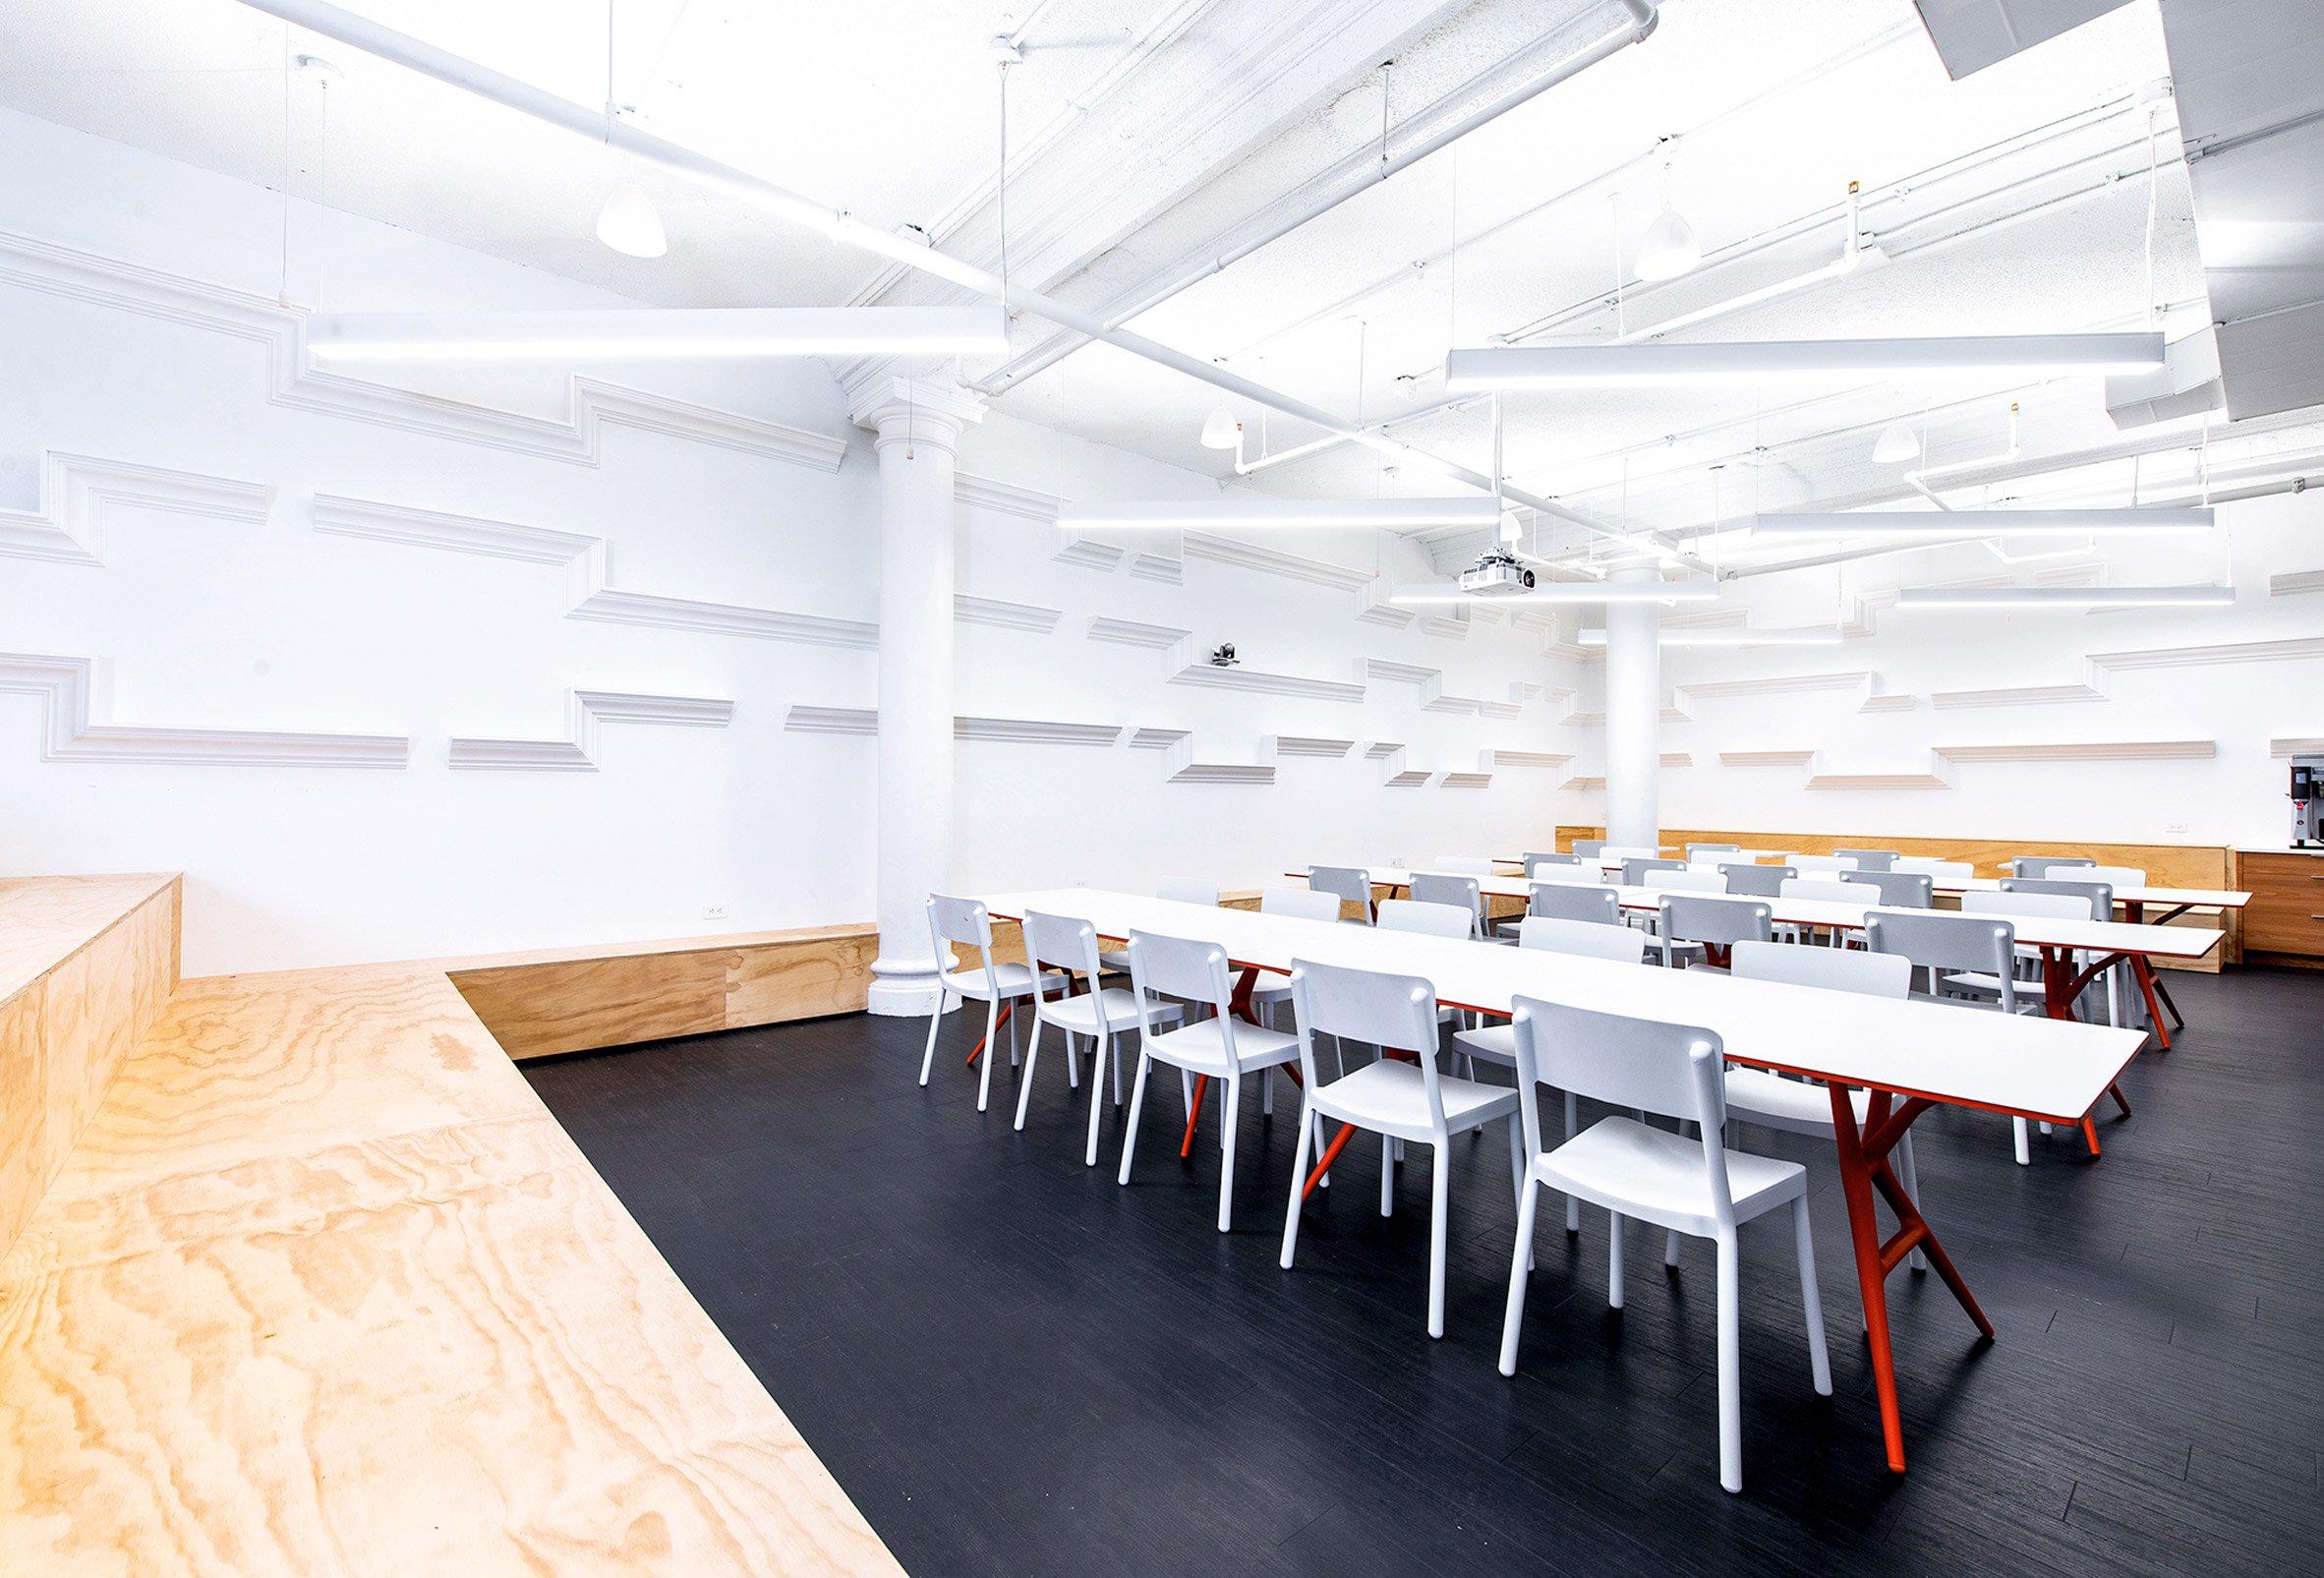 architecture-interiors-offices- manhatten-new-york-design-studia-osnovadesign-osnova-poltava_17